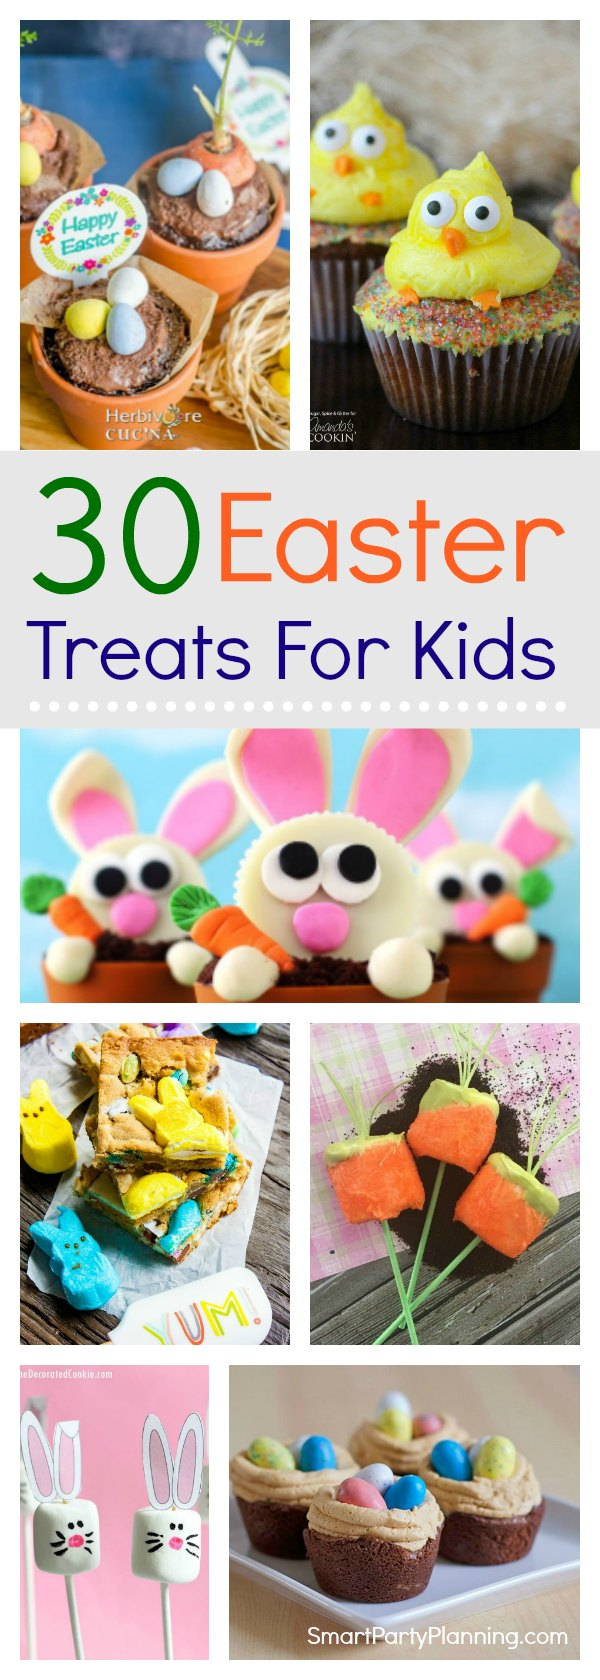 30 Easter Treats For Kids